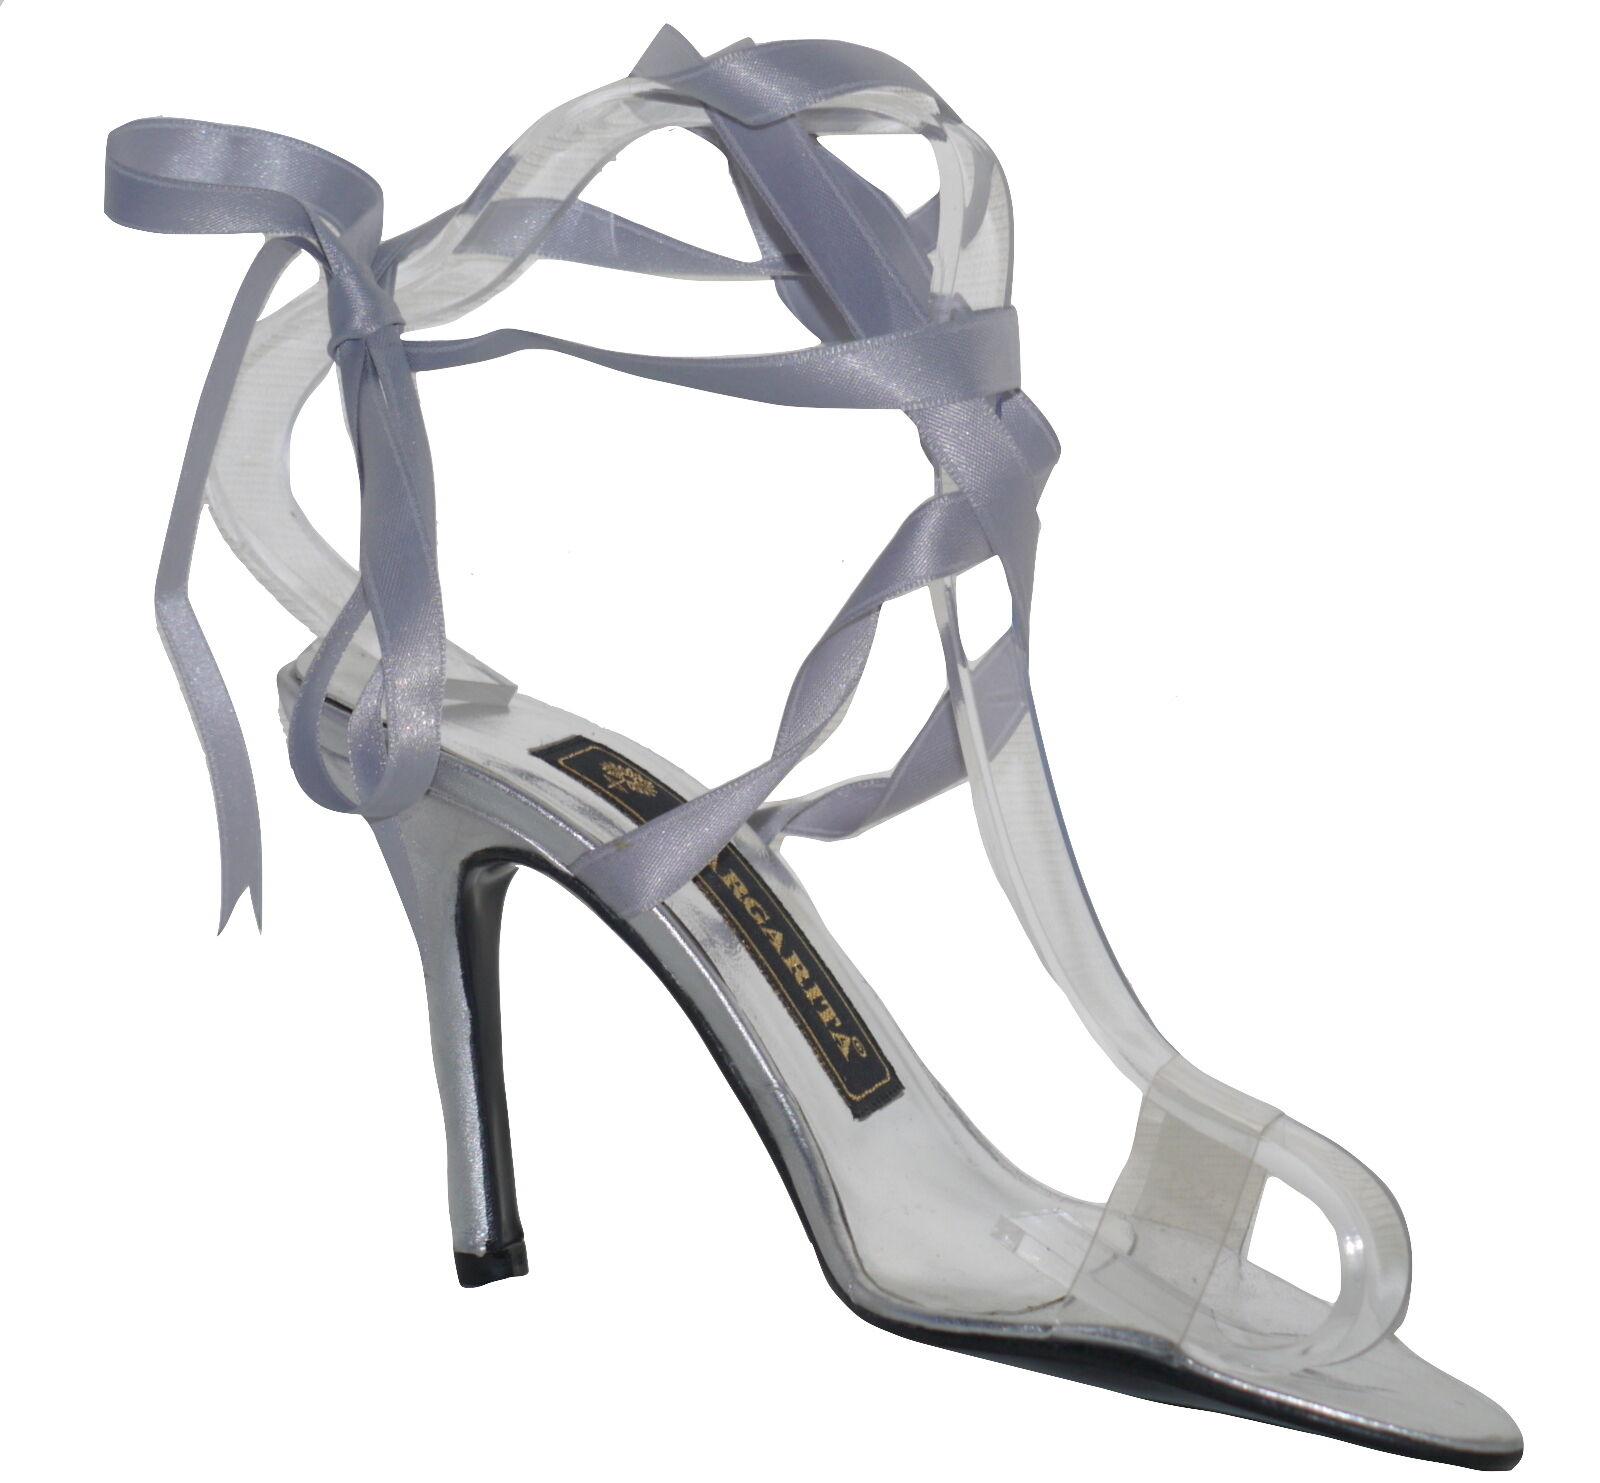 Margarita Silver Leather Transparent Heeled Sandal Size UK 3 EU 36 Shop Pair NEW